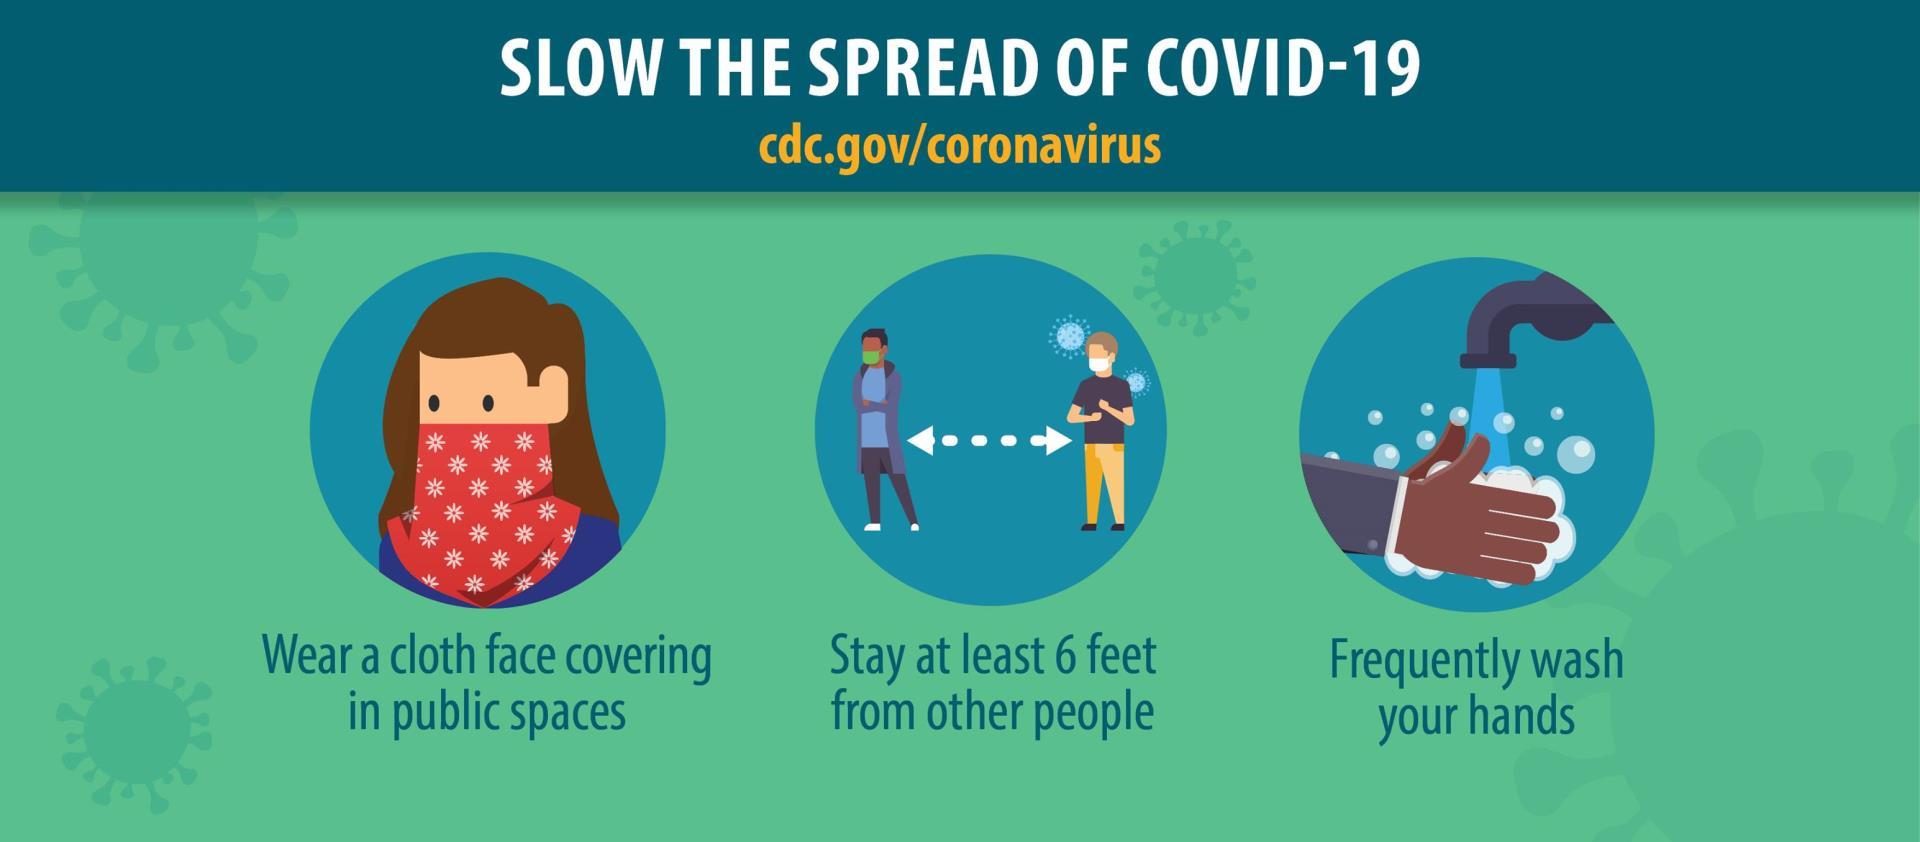 Coronavirus Disease City Of Evanston